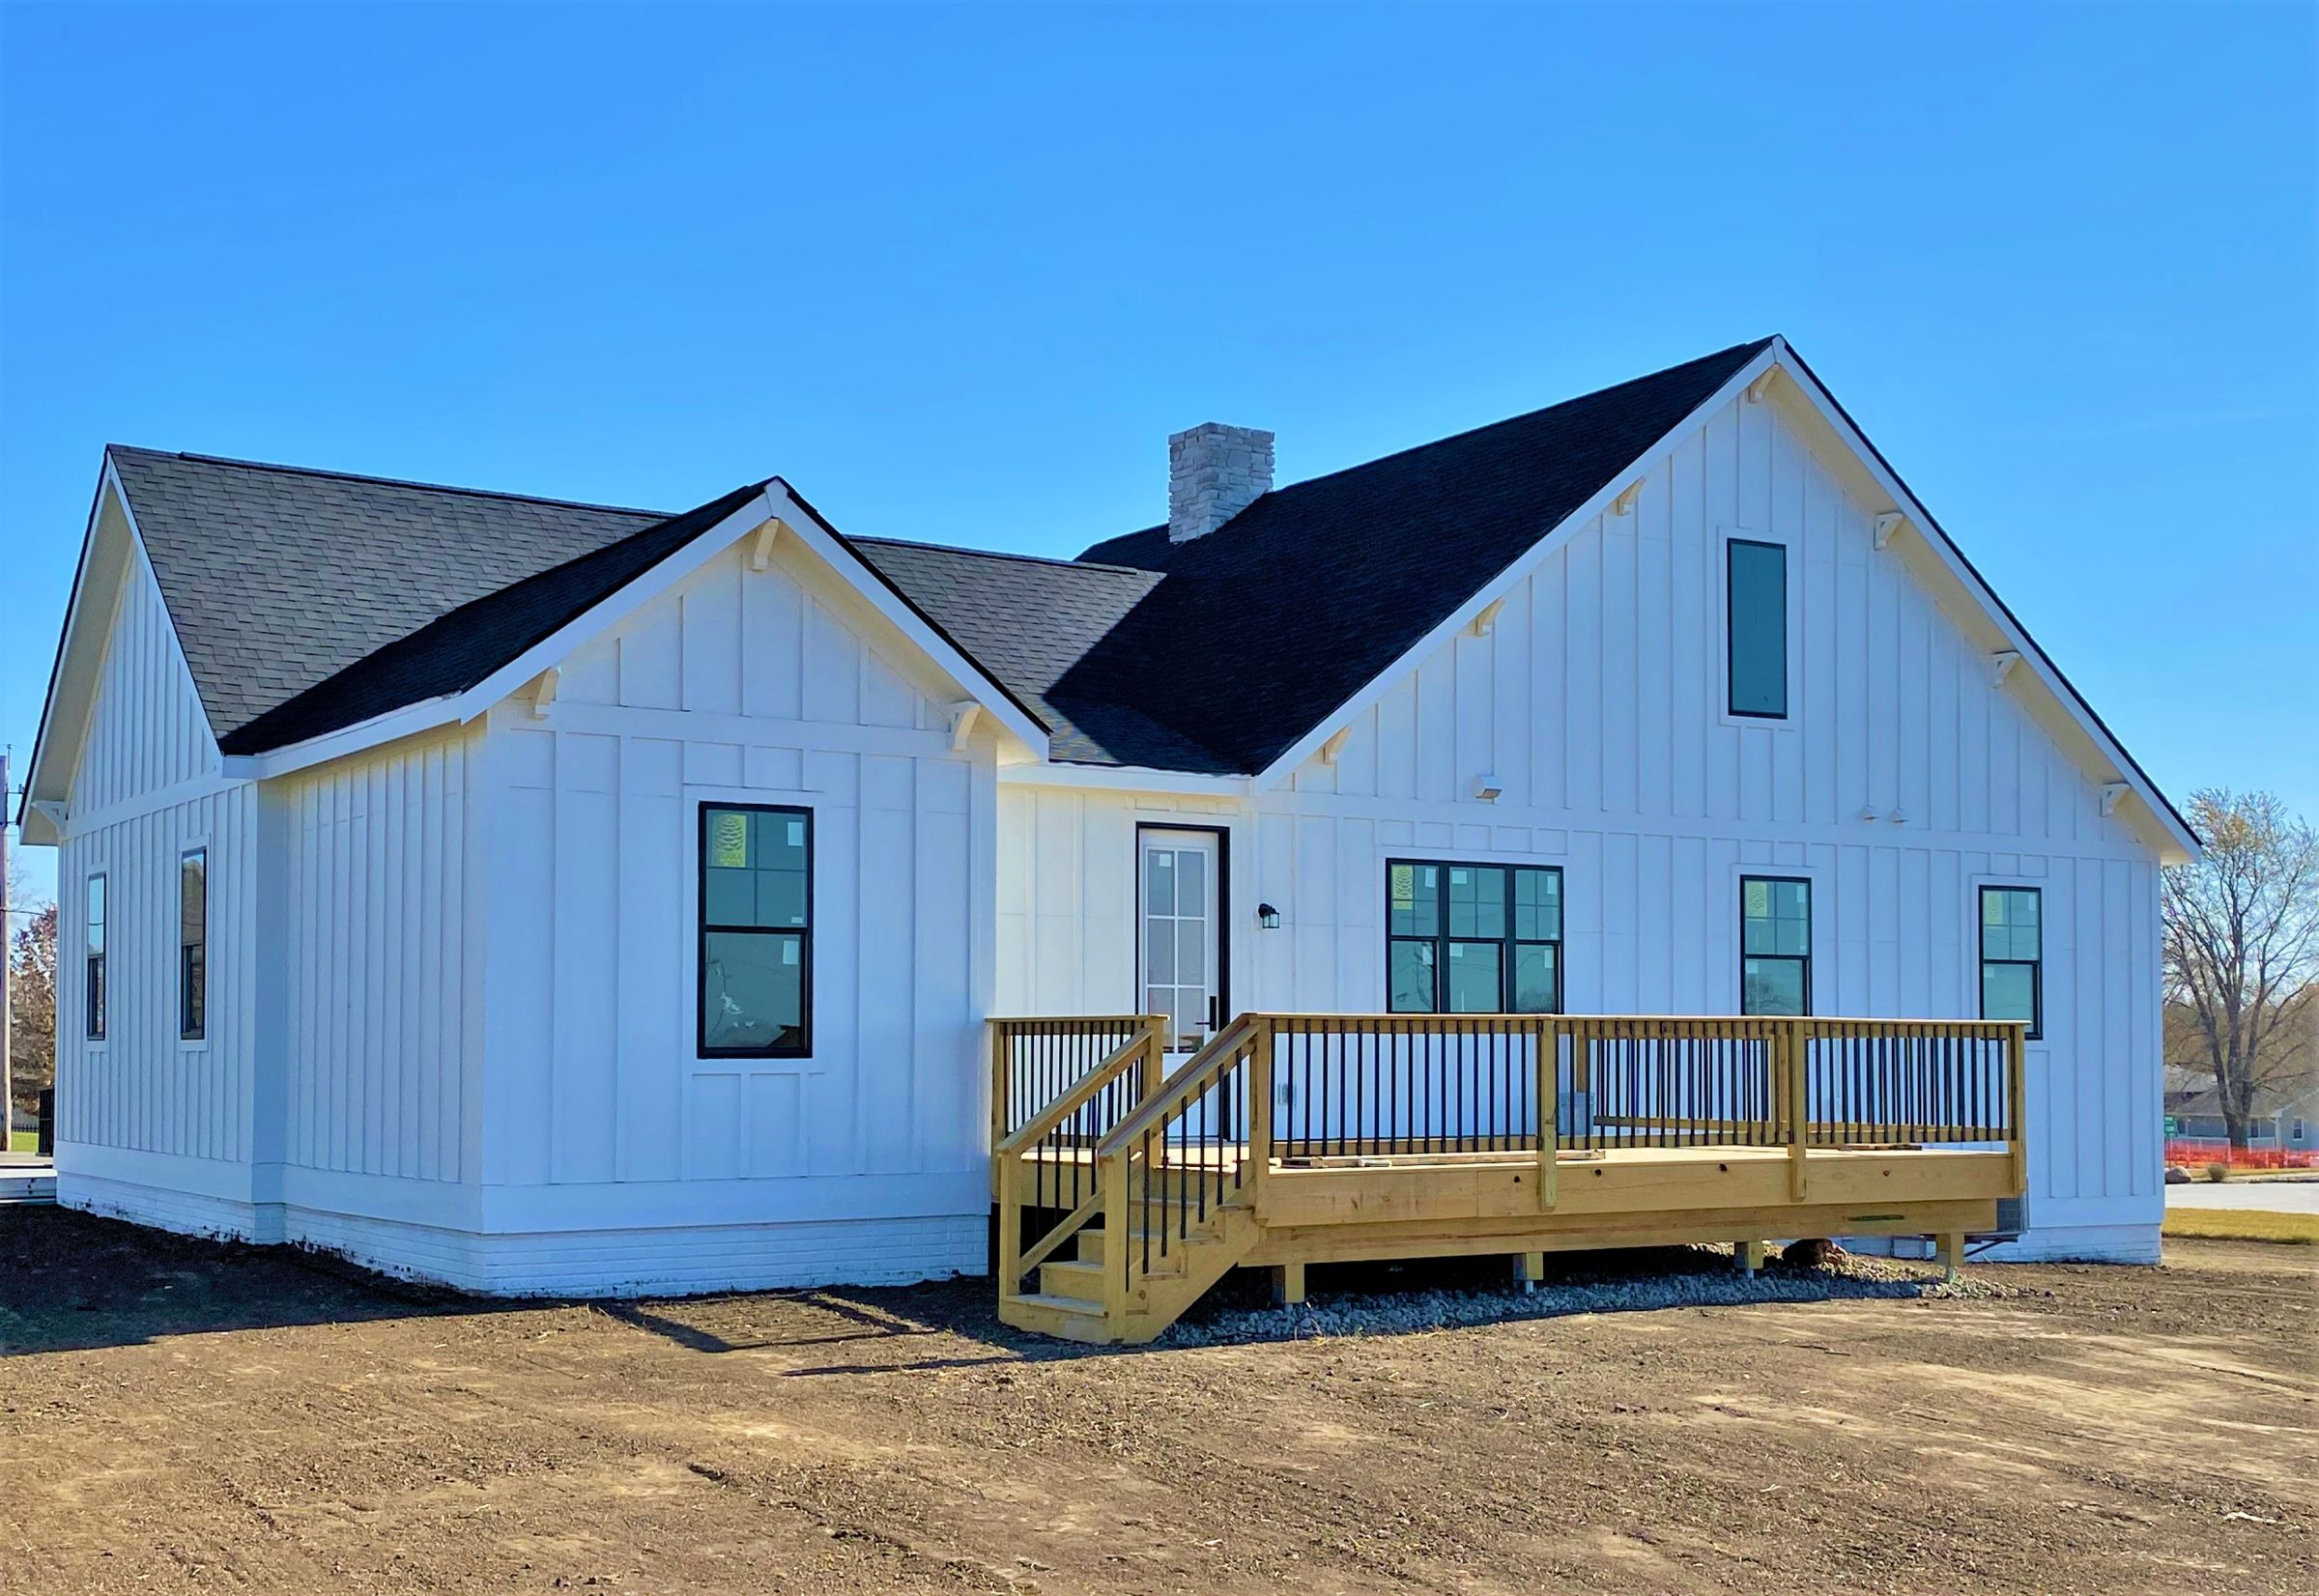 residential-warren-county-iowa-1-acres-listing-number-15096-0-2020-11-12-213551.jpg